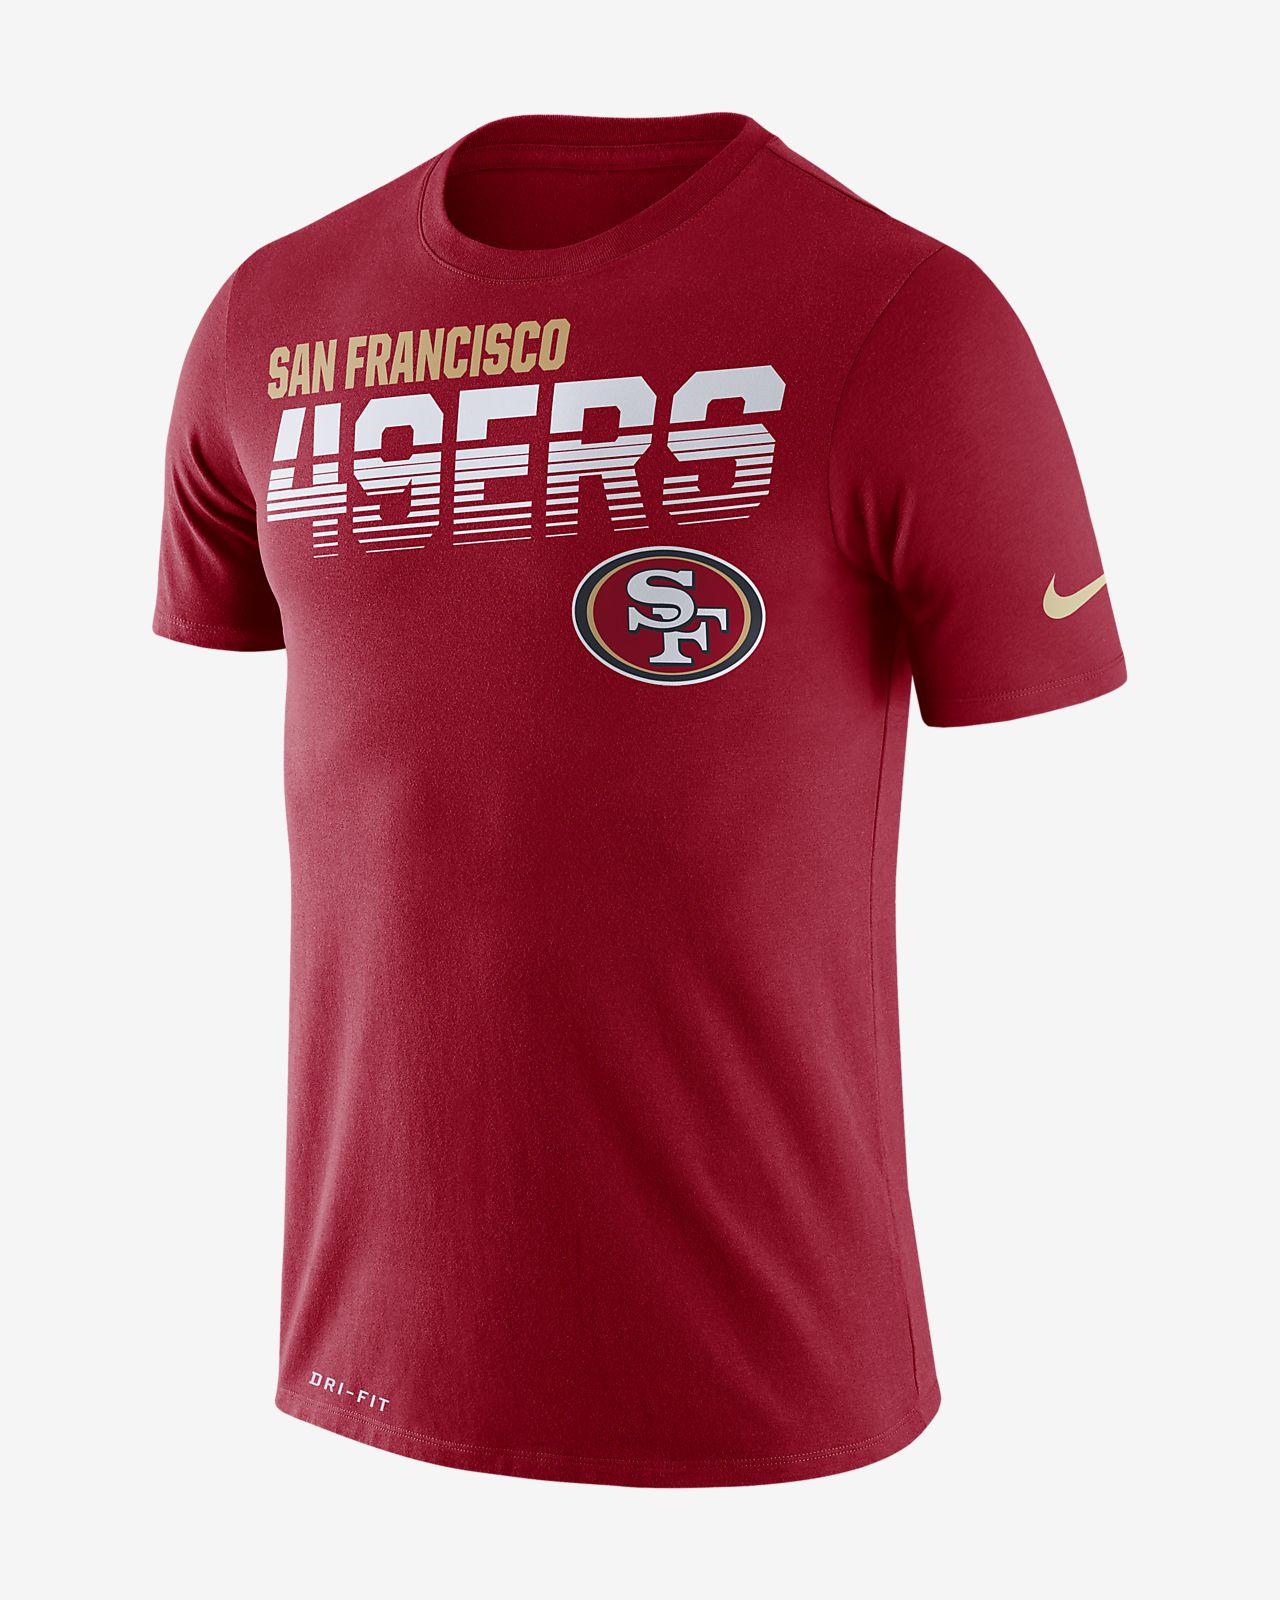 Nike Legend (NFL 49ers) Men's Short-Sleeve T-Shirt